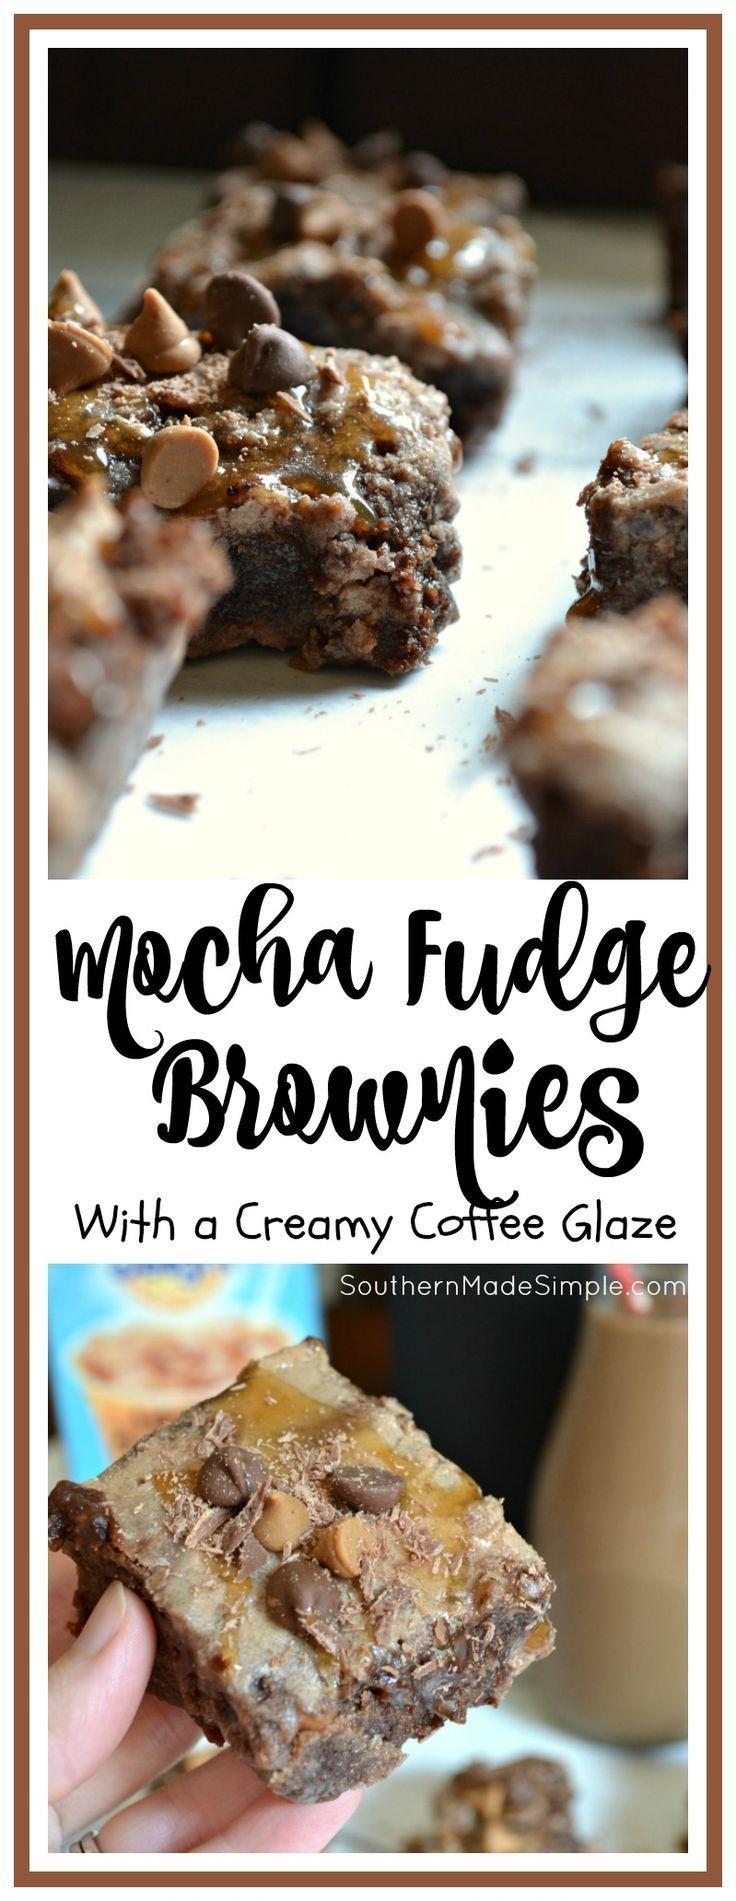 Mocha Fudge Brownies with Creamy Coffee Glaze #chocolatecoveredcoffeebeans